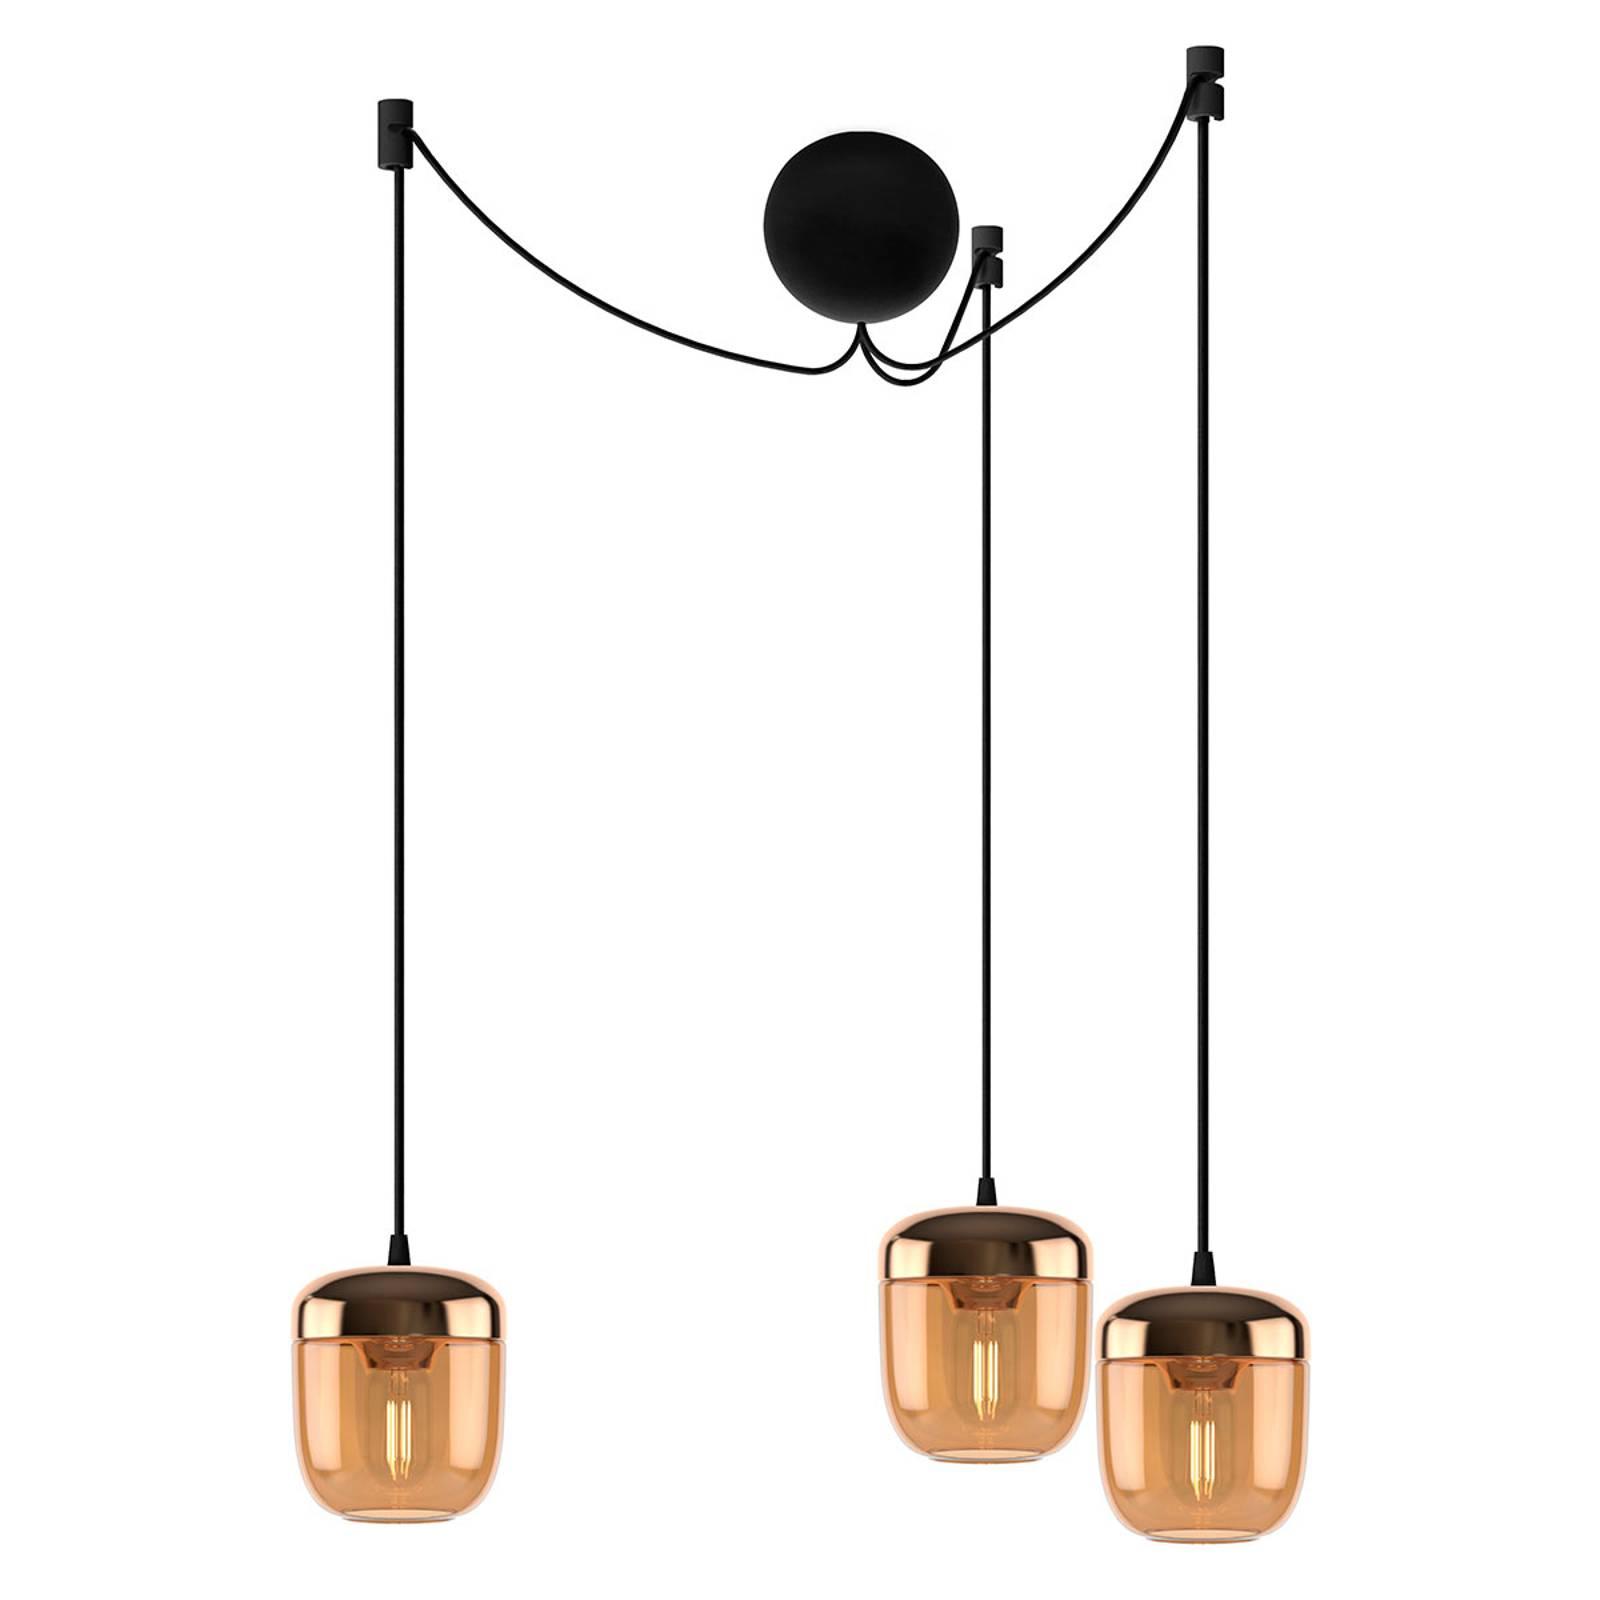 UMAGE Acorn hanglamp 3 lampje aardewerk staal